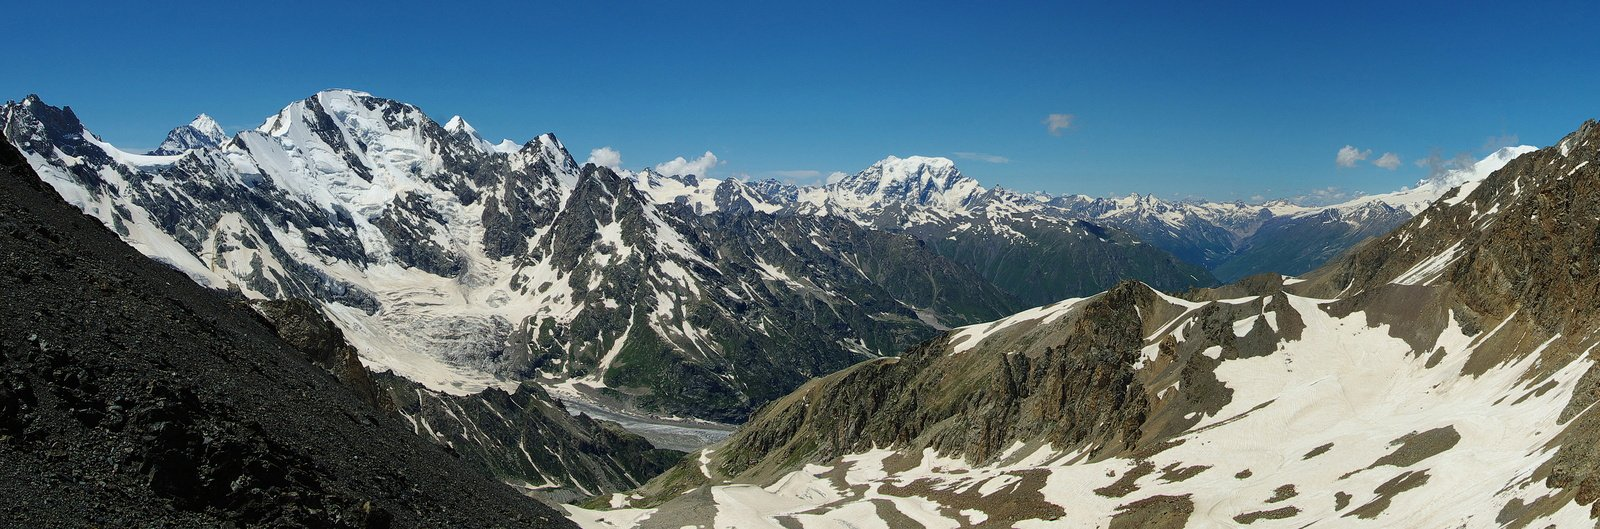 приэльбрусье, панорама, горы, кавказ, койавган,, Максим Рогозин